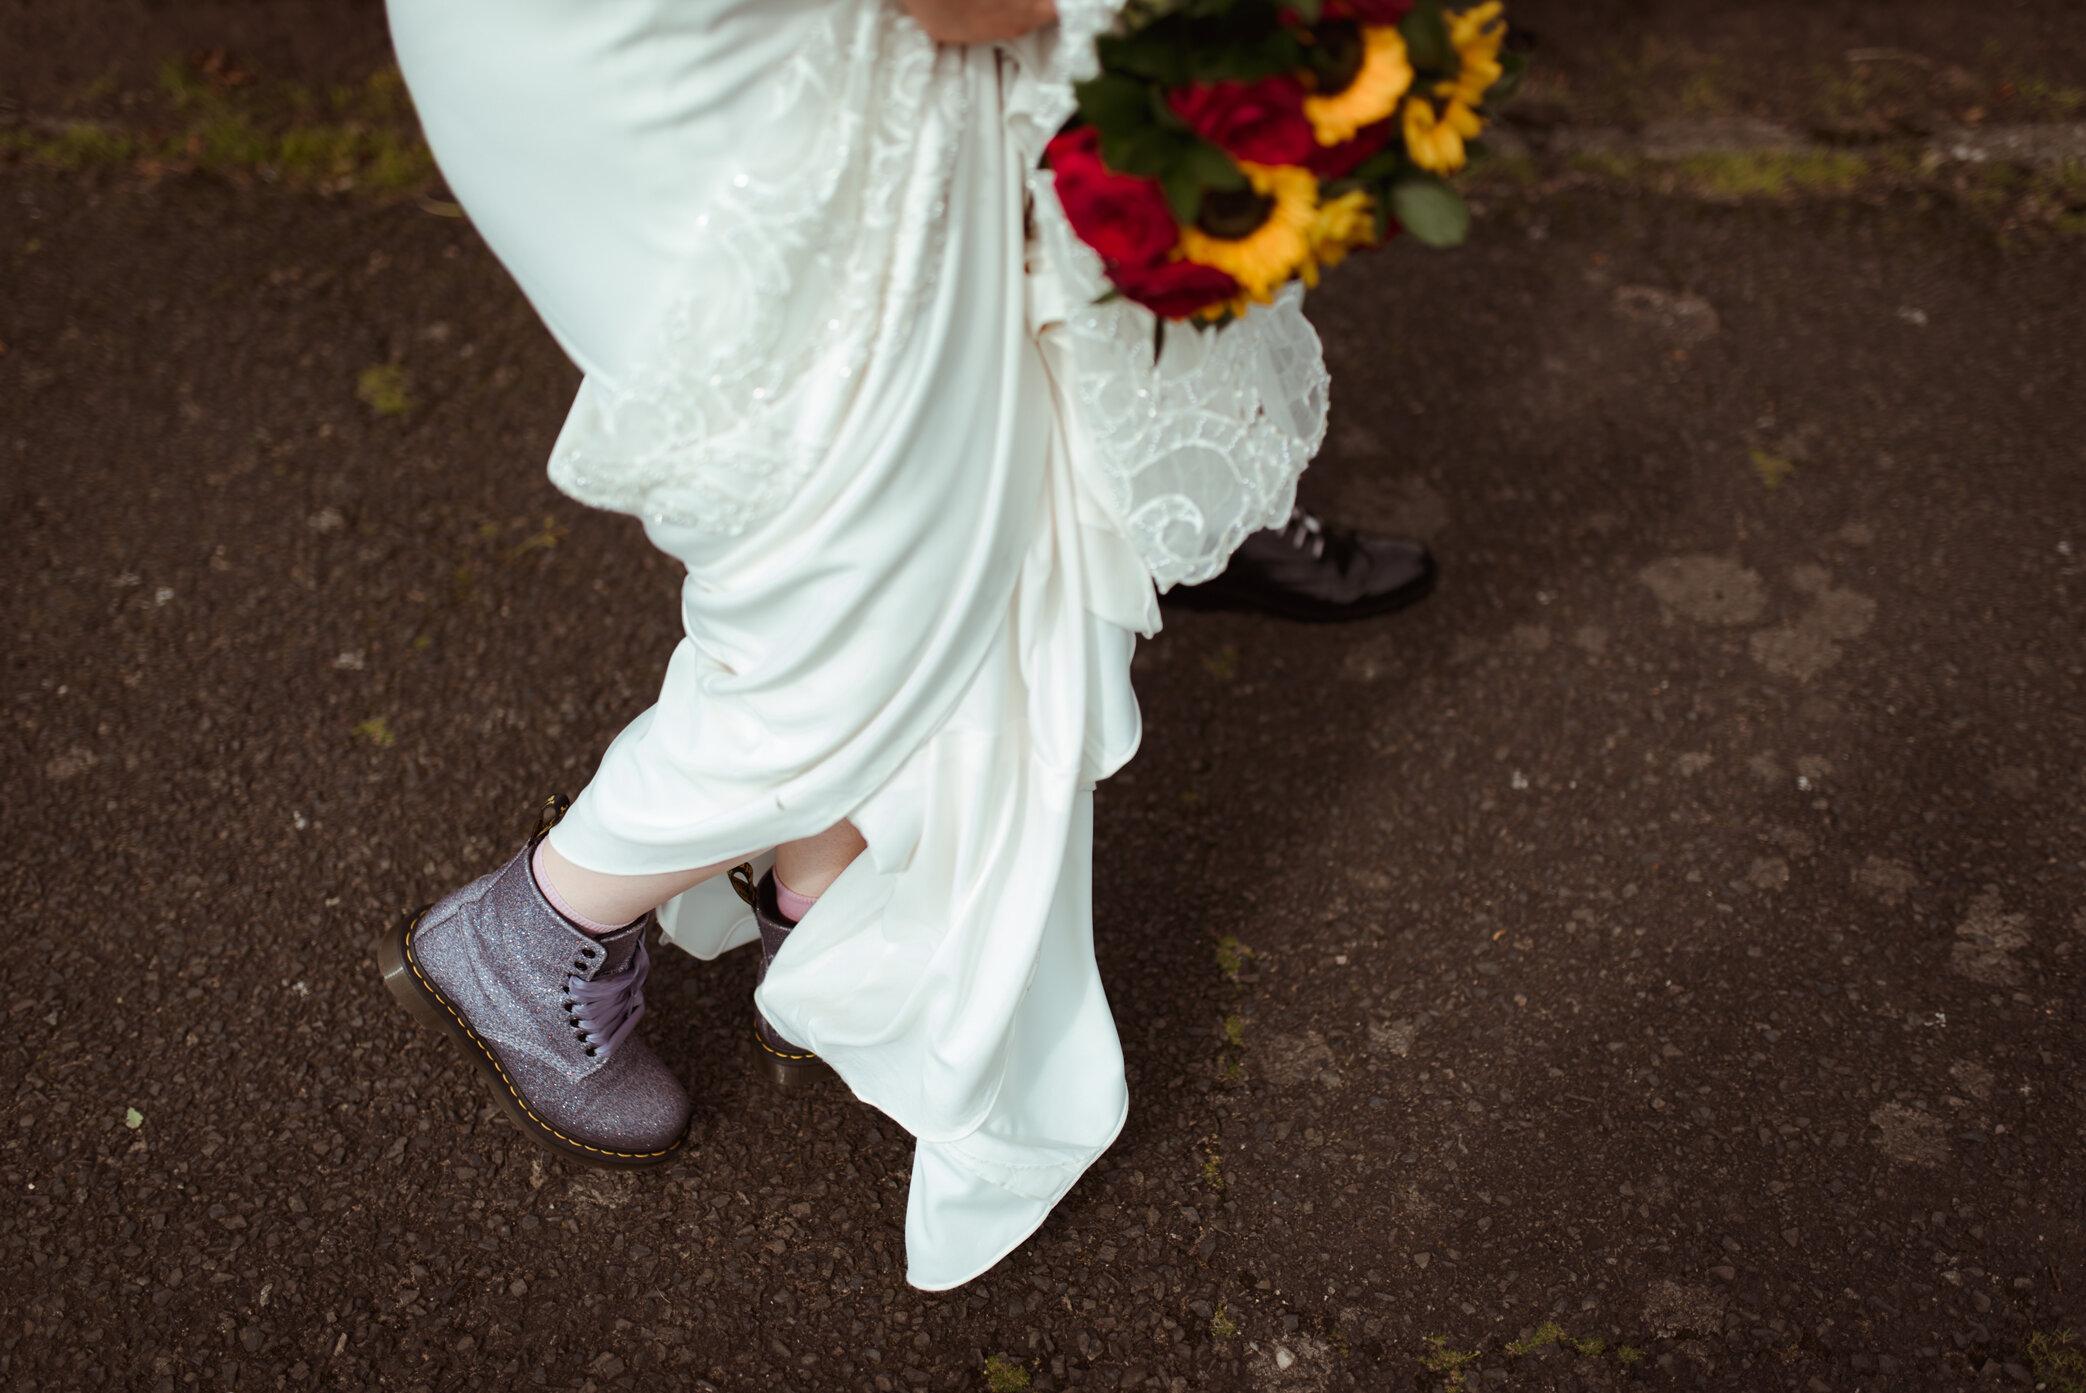 alternative-wedding-photography-glasgow-dumbarton (4).jpg